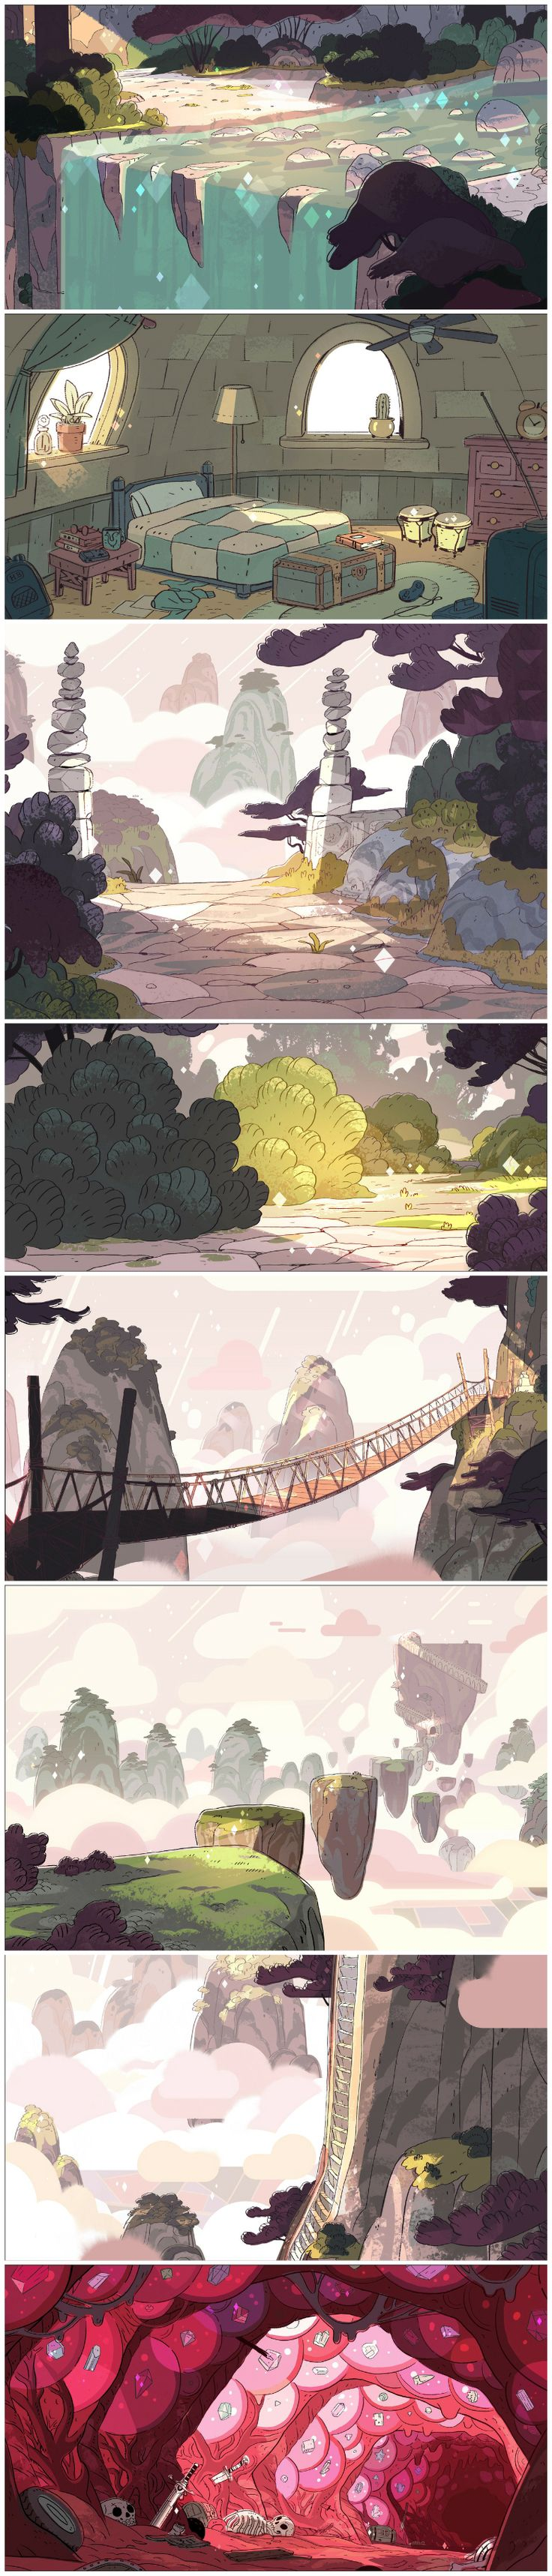 "A selection of Backgrounds from the Steven Universe episode: ""Giant Woman"" Art Direction: Kevin Dart Design: Sam Bosma Paint: Elle Michalka, Jasmin Lai"